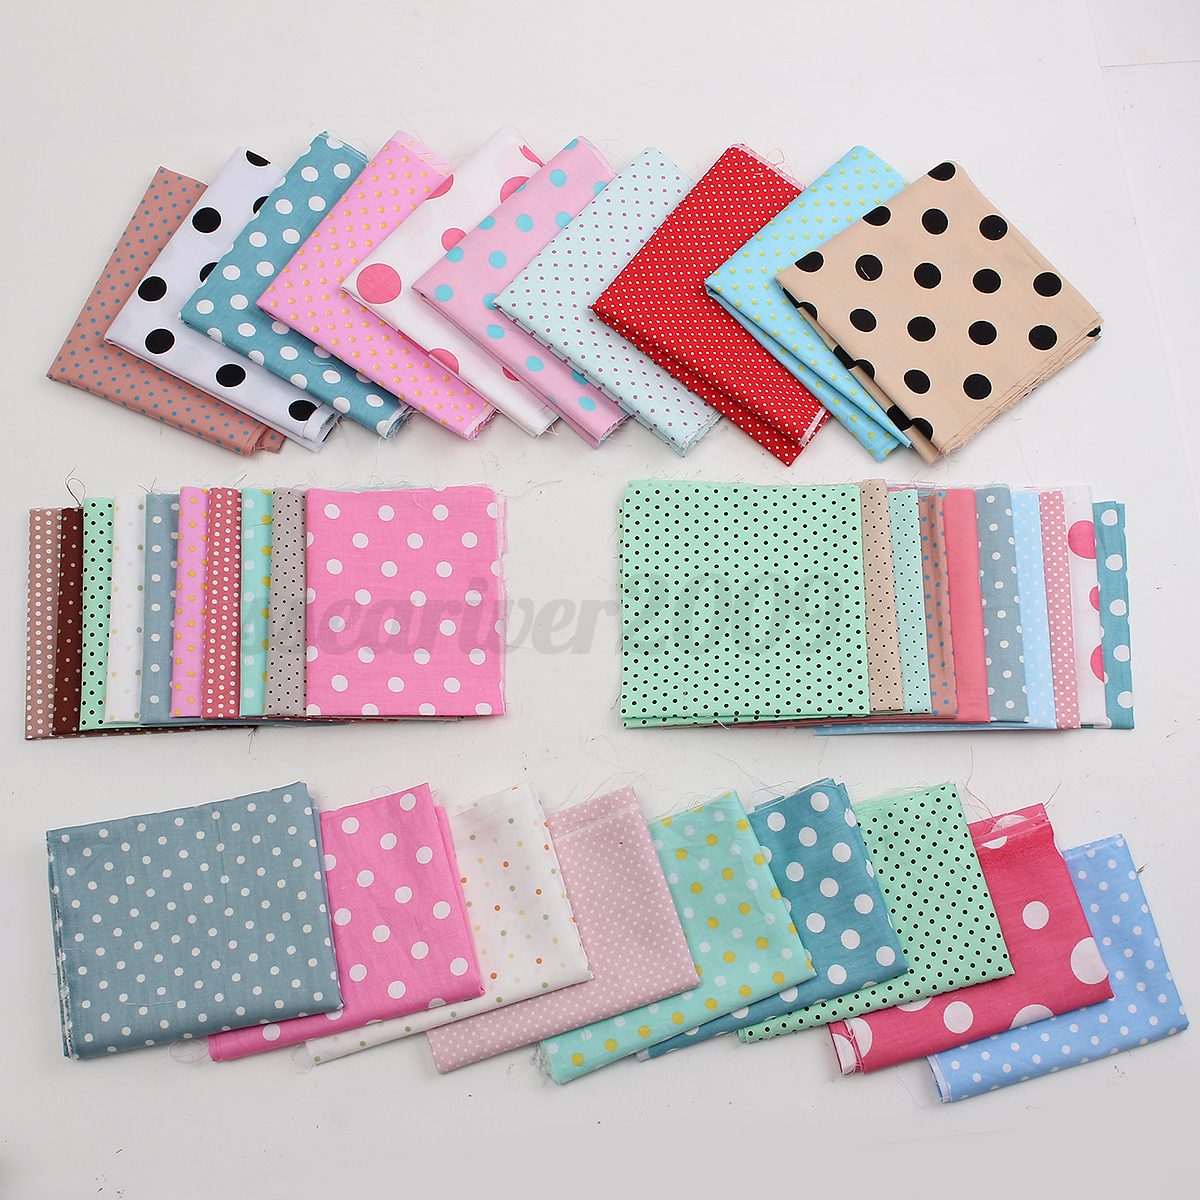 10pcs Colorful Floral Fabric Cotton Cloth DIY Sewing Quilt